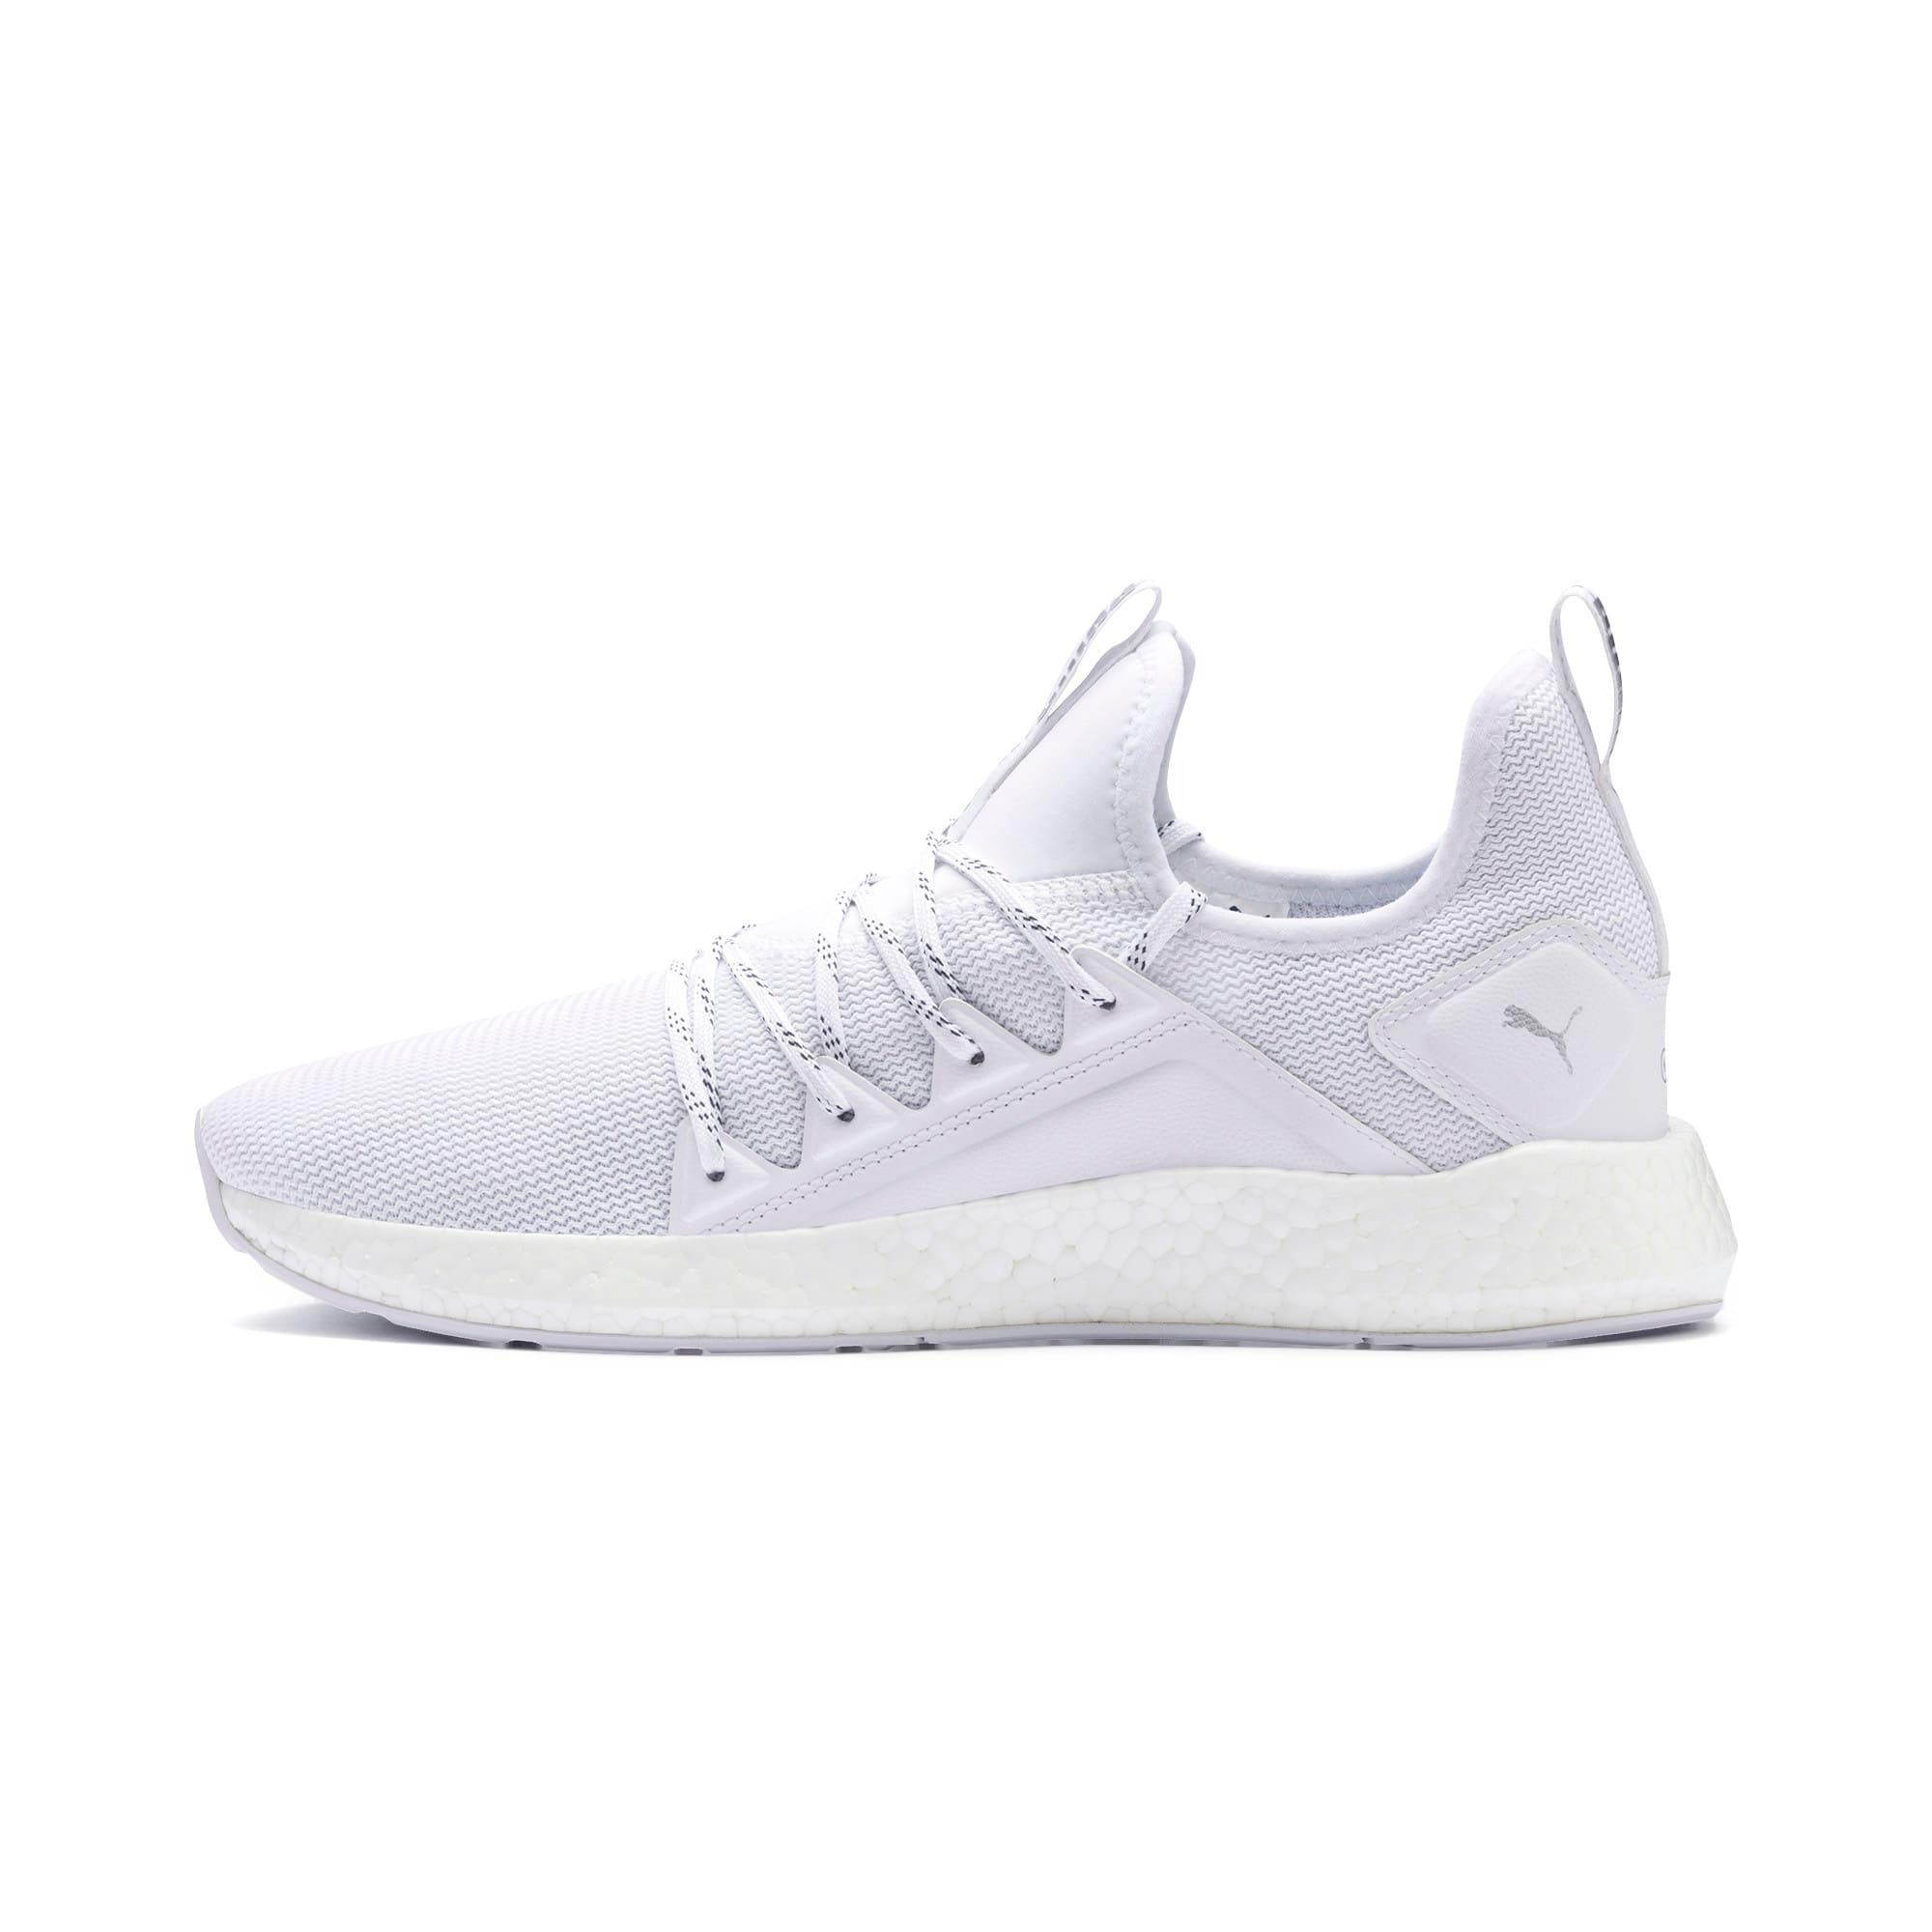 Thumbnail 1 of NRGY Neko Lights Men's Running Shoes, Puma White, medium